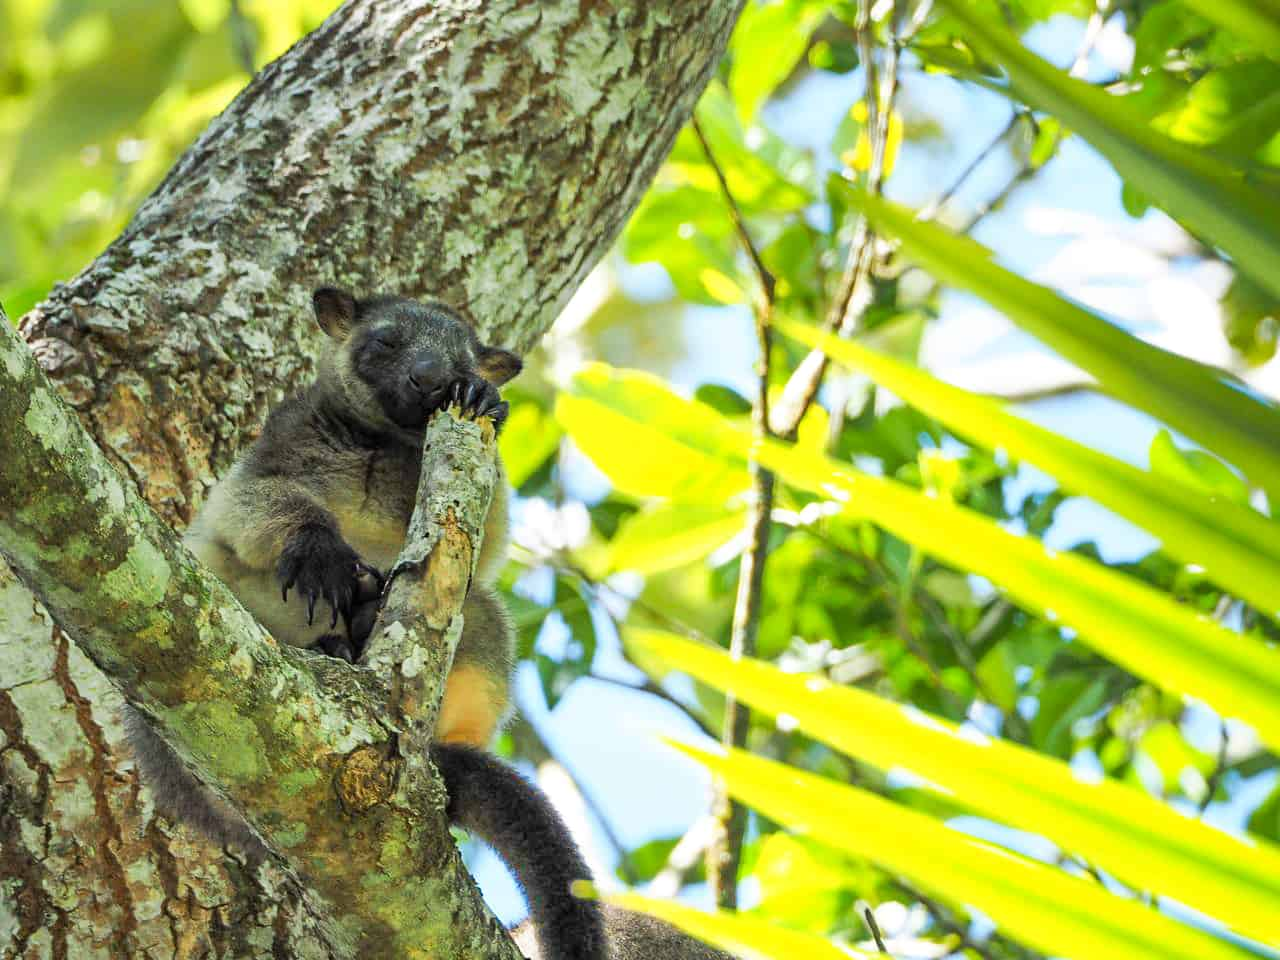 Lumholtz's-Tree-Kangaroo-Nerada-Tea-Plantation-Atherton-Tablelands-North-Queensland-Australia ] Travel Mermaid 051